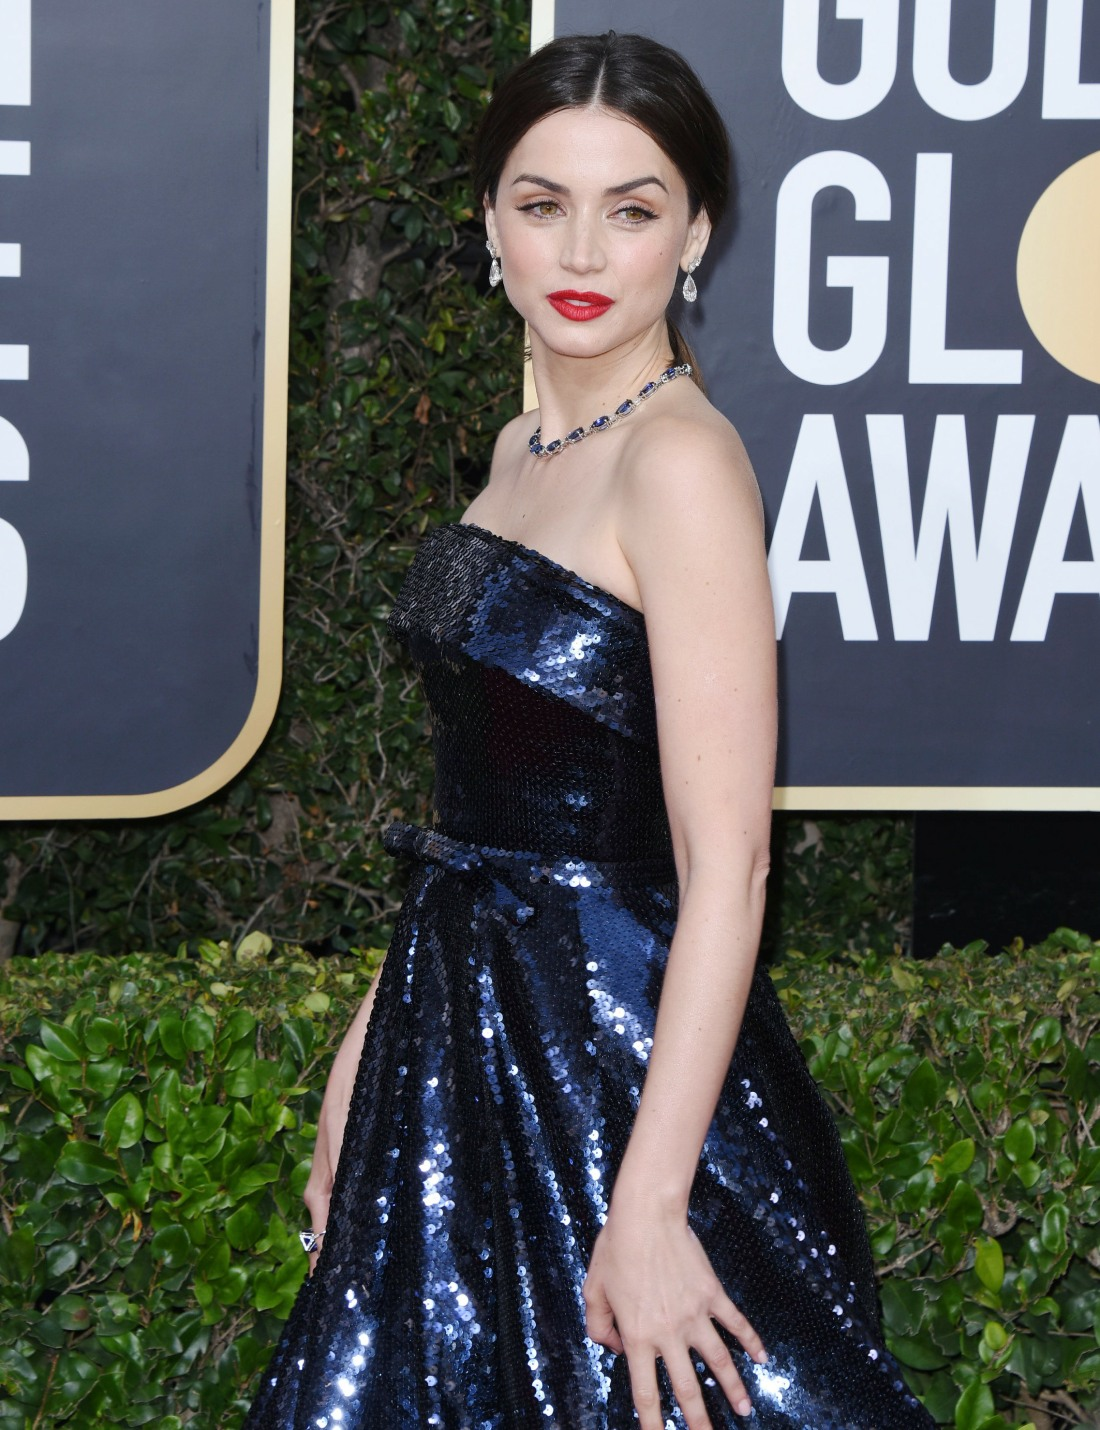 Ana de Armas attends the 77th Annual Golden Globe Awards at The Beverly Hilton Hotel on January 05, 2020 in Beverly Hills, California© Jill Johnson/jpistudios.com